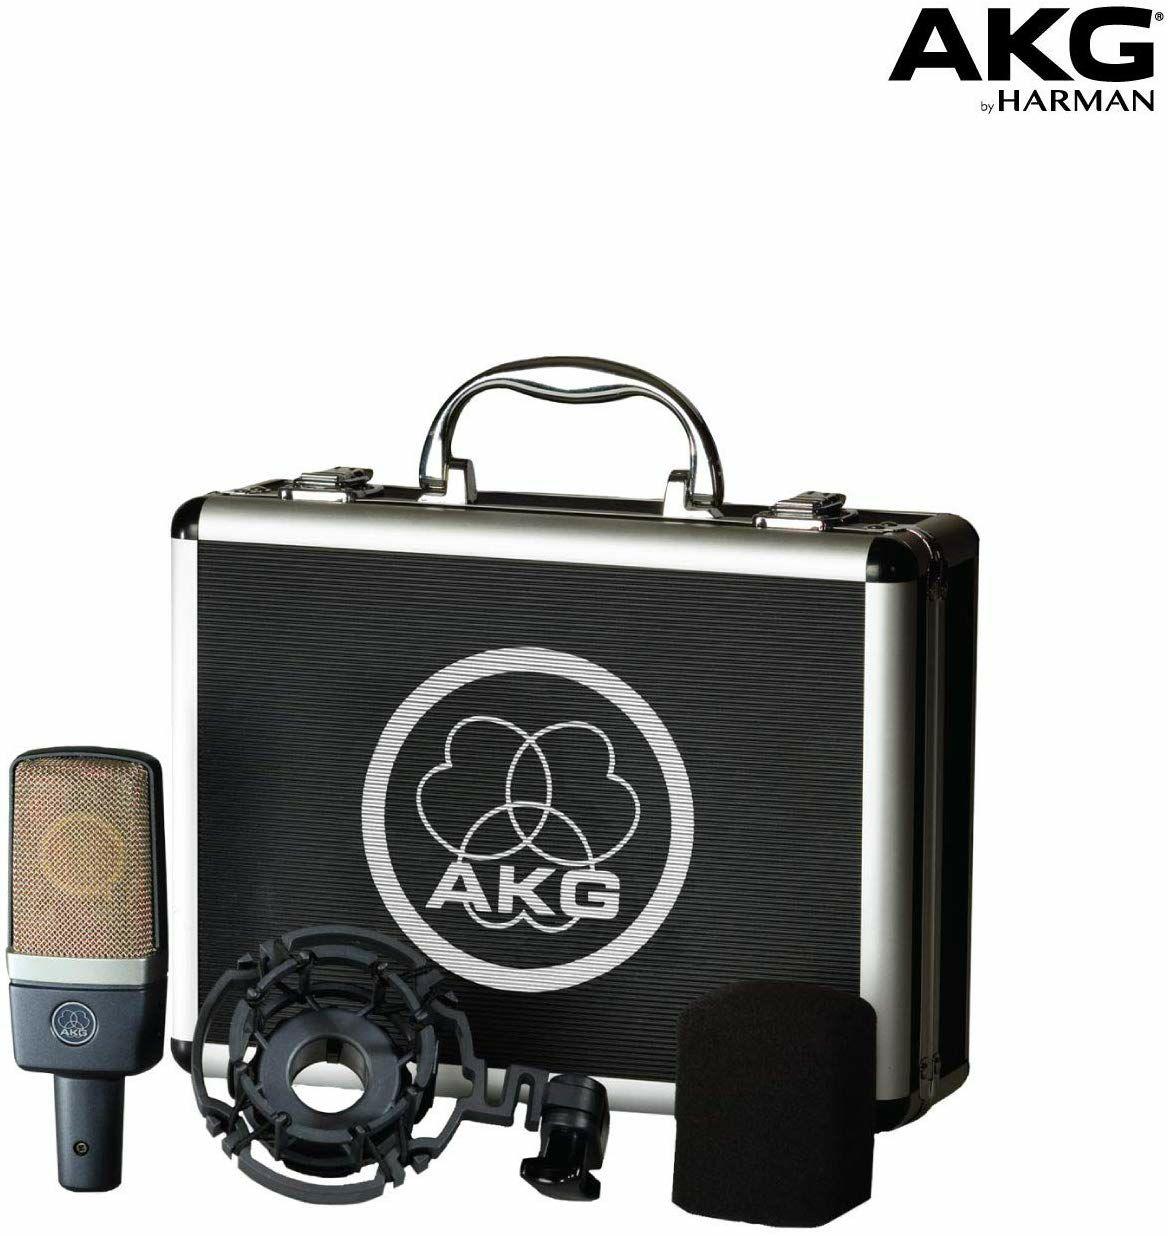 AKG AKGC214 Großmembran Kondensatormikrofon - professionelles Studio-Mikrofon inkl. Spinnen-Halterung, Windschutz & Metallkoffer